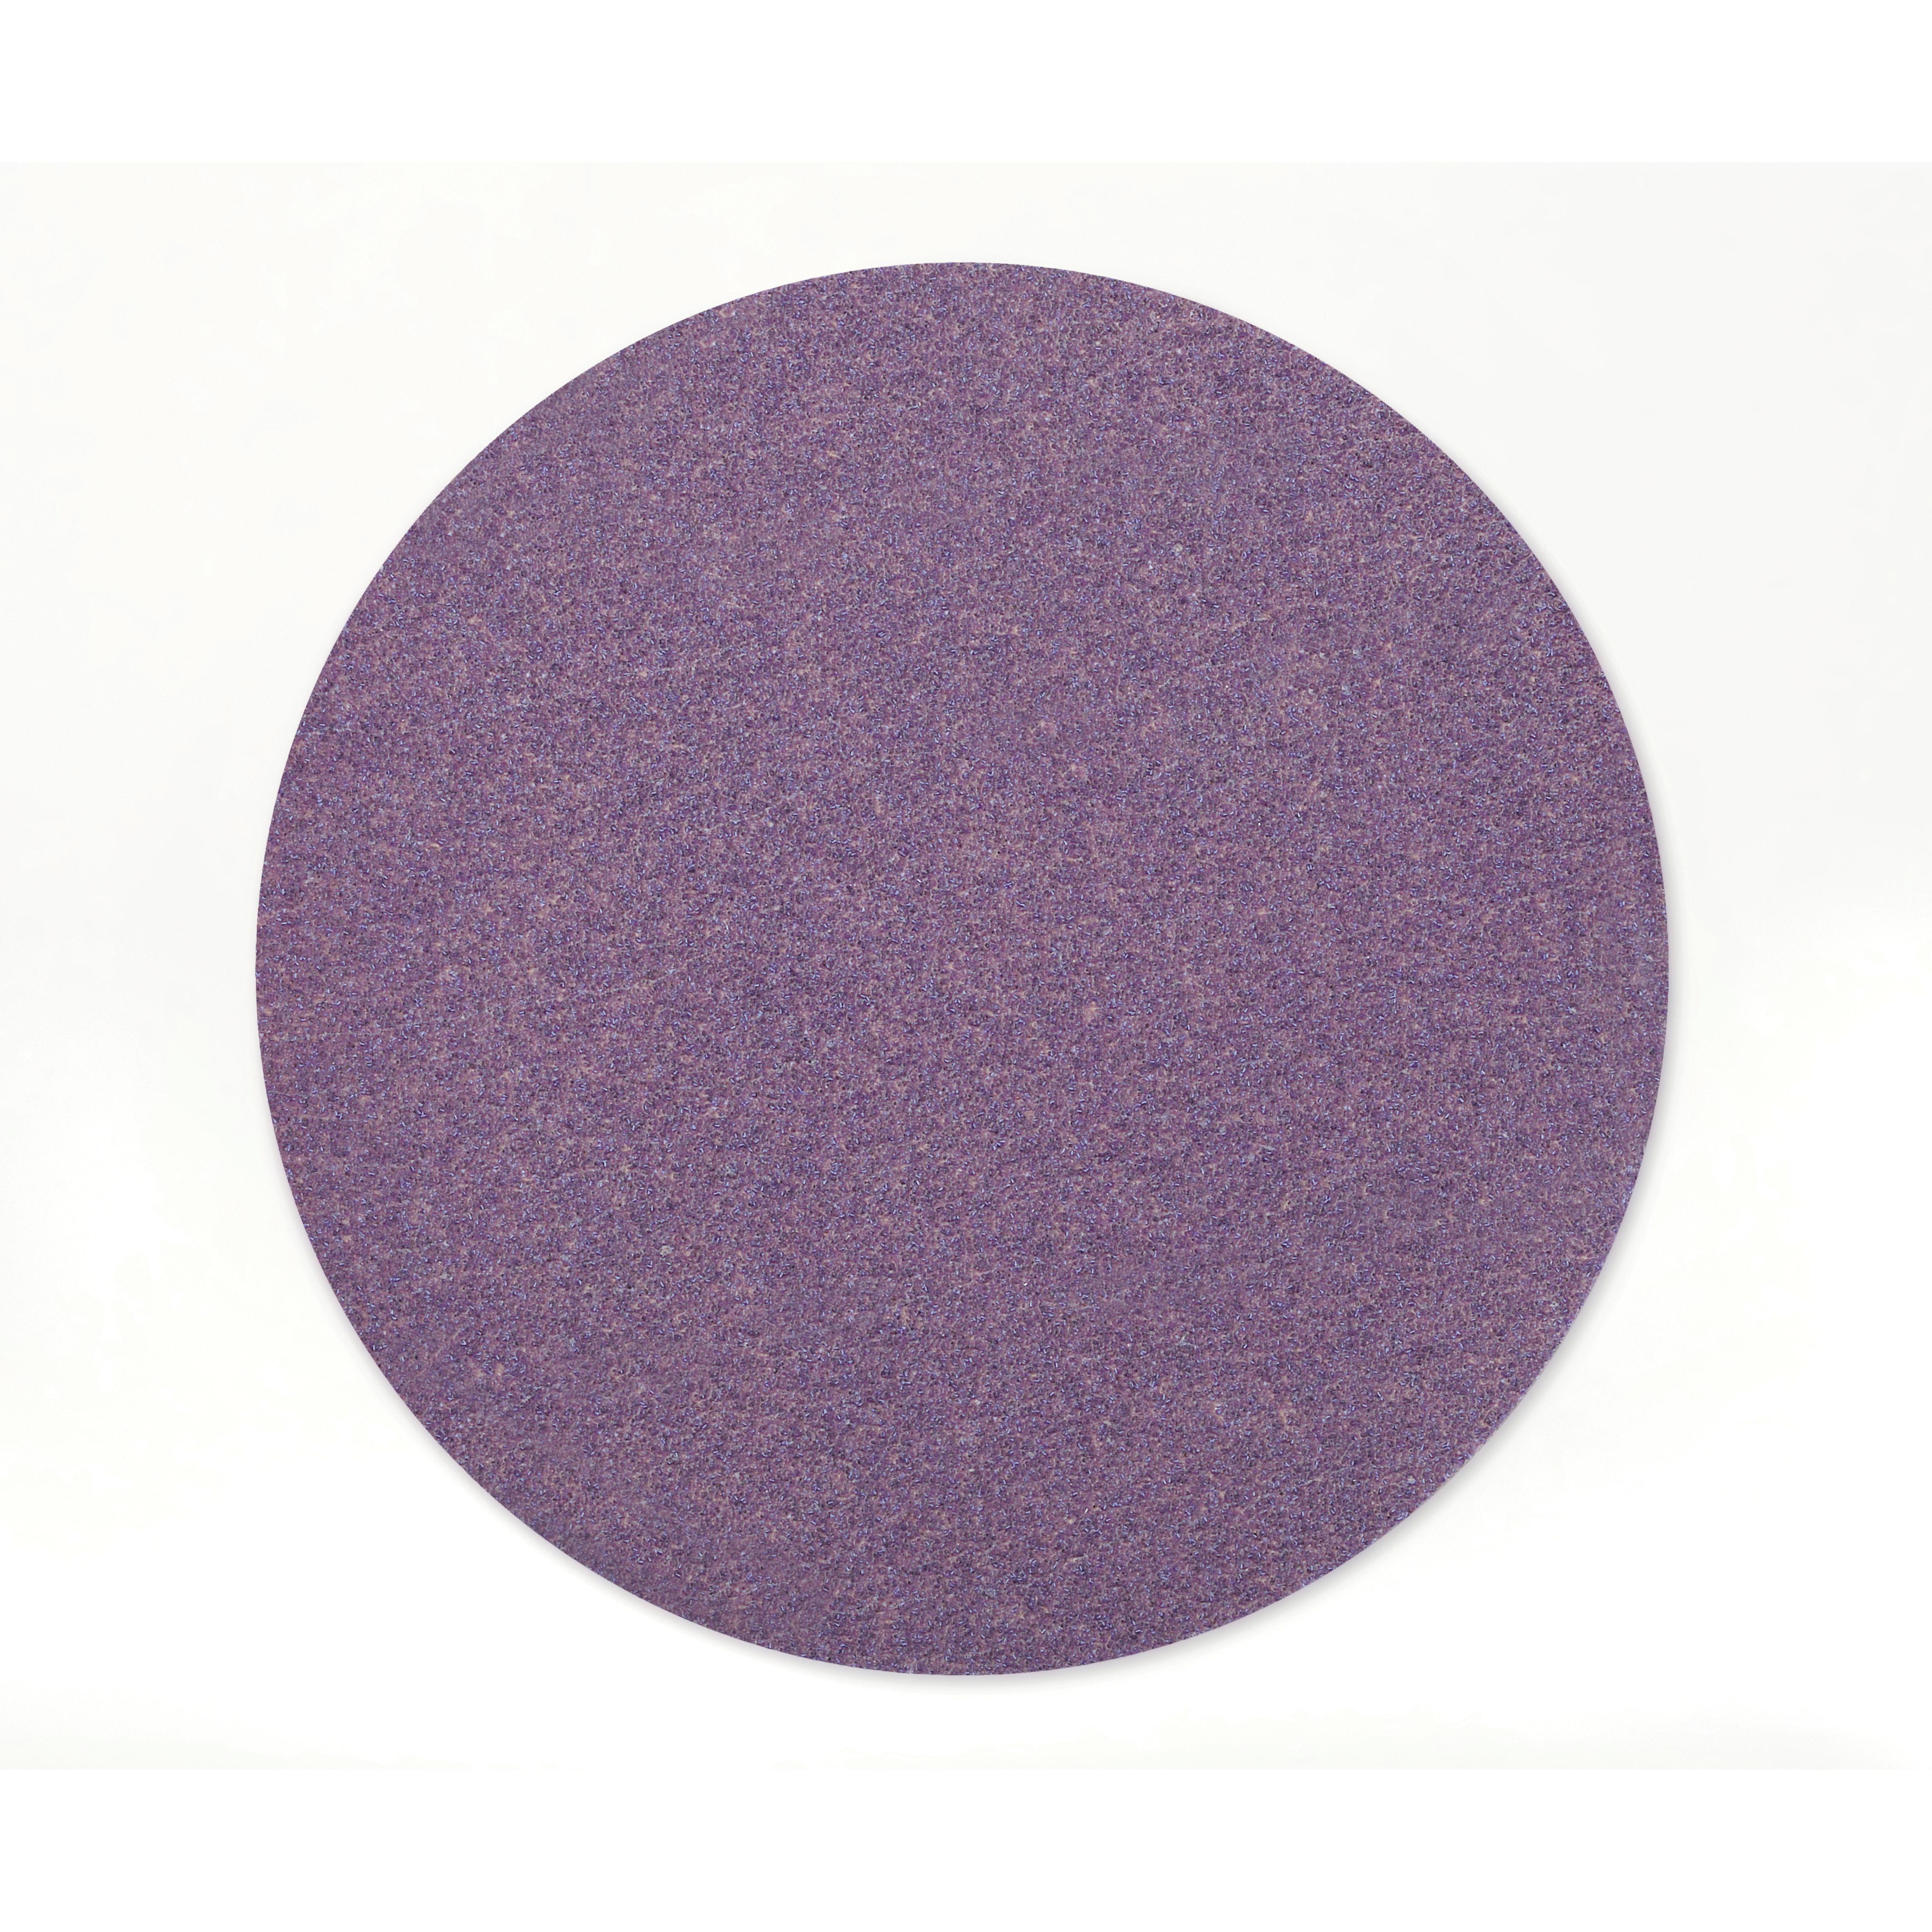 Cubitron™ II 051125-86828 732U Linered Open Coated PSA Mounted Point, 6 in Dia Disc, 80+ Grit, Ceramic Alumina Abrasive, Paper Backing